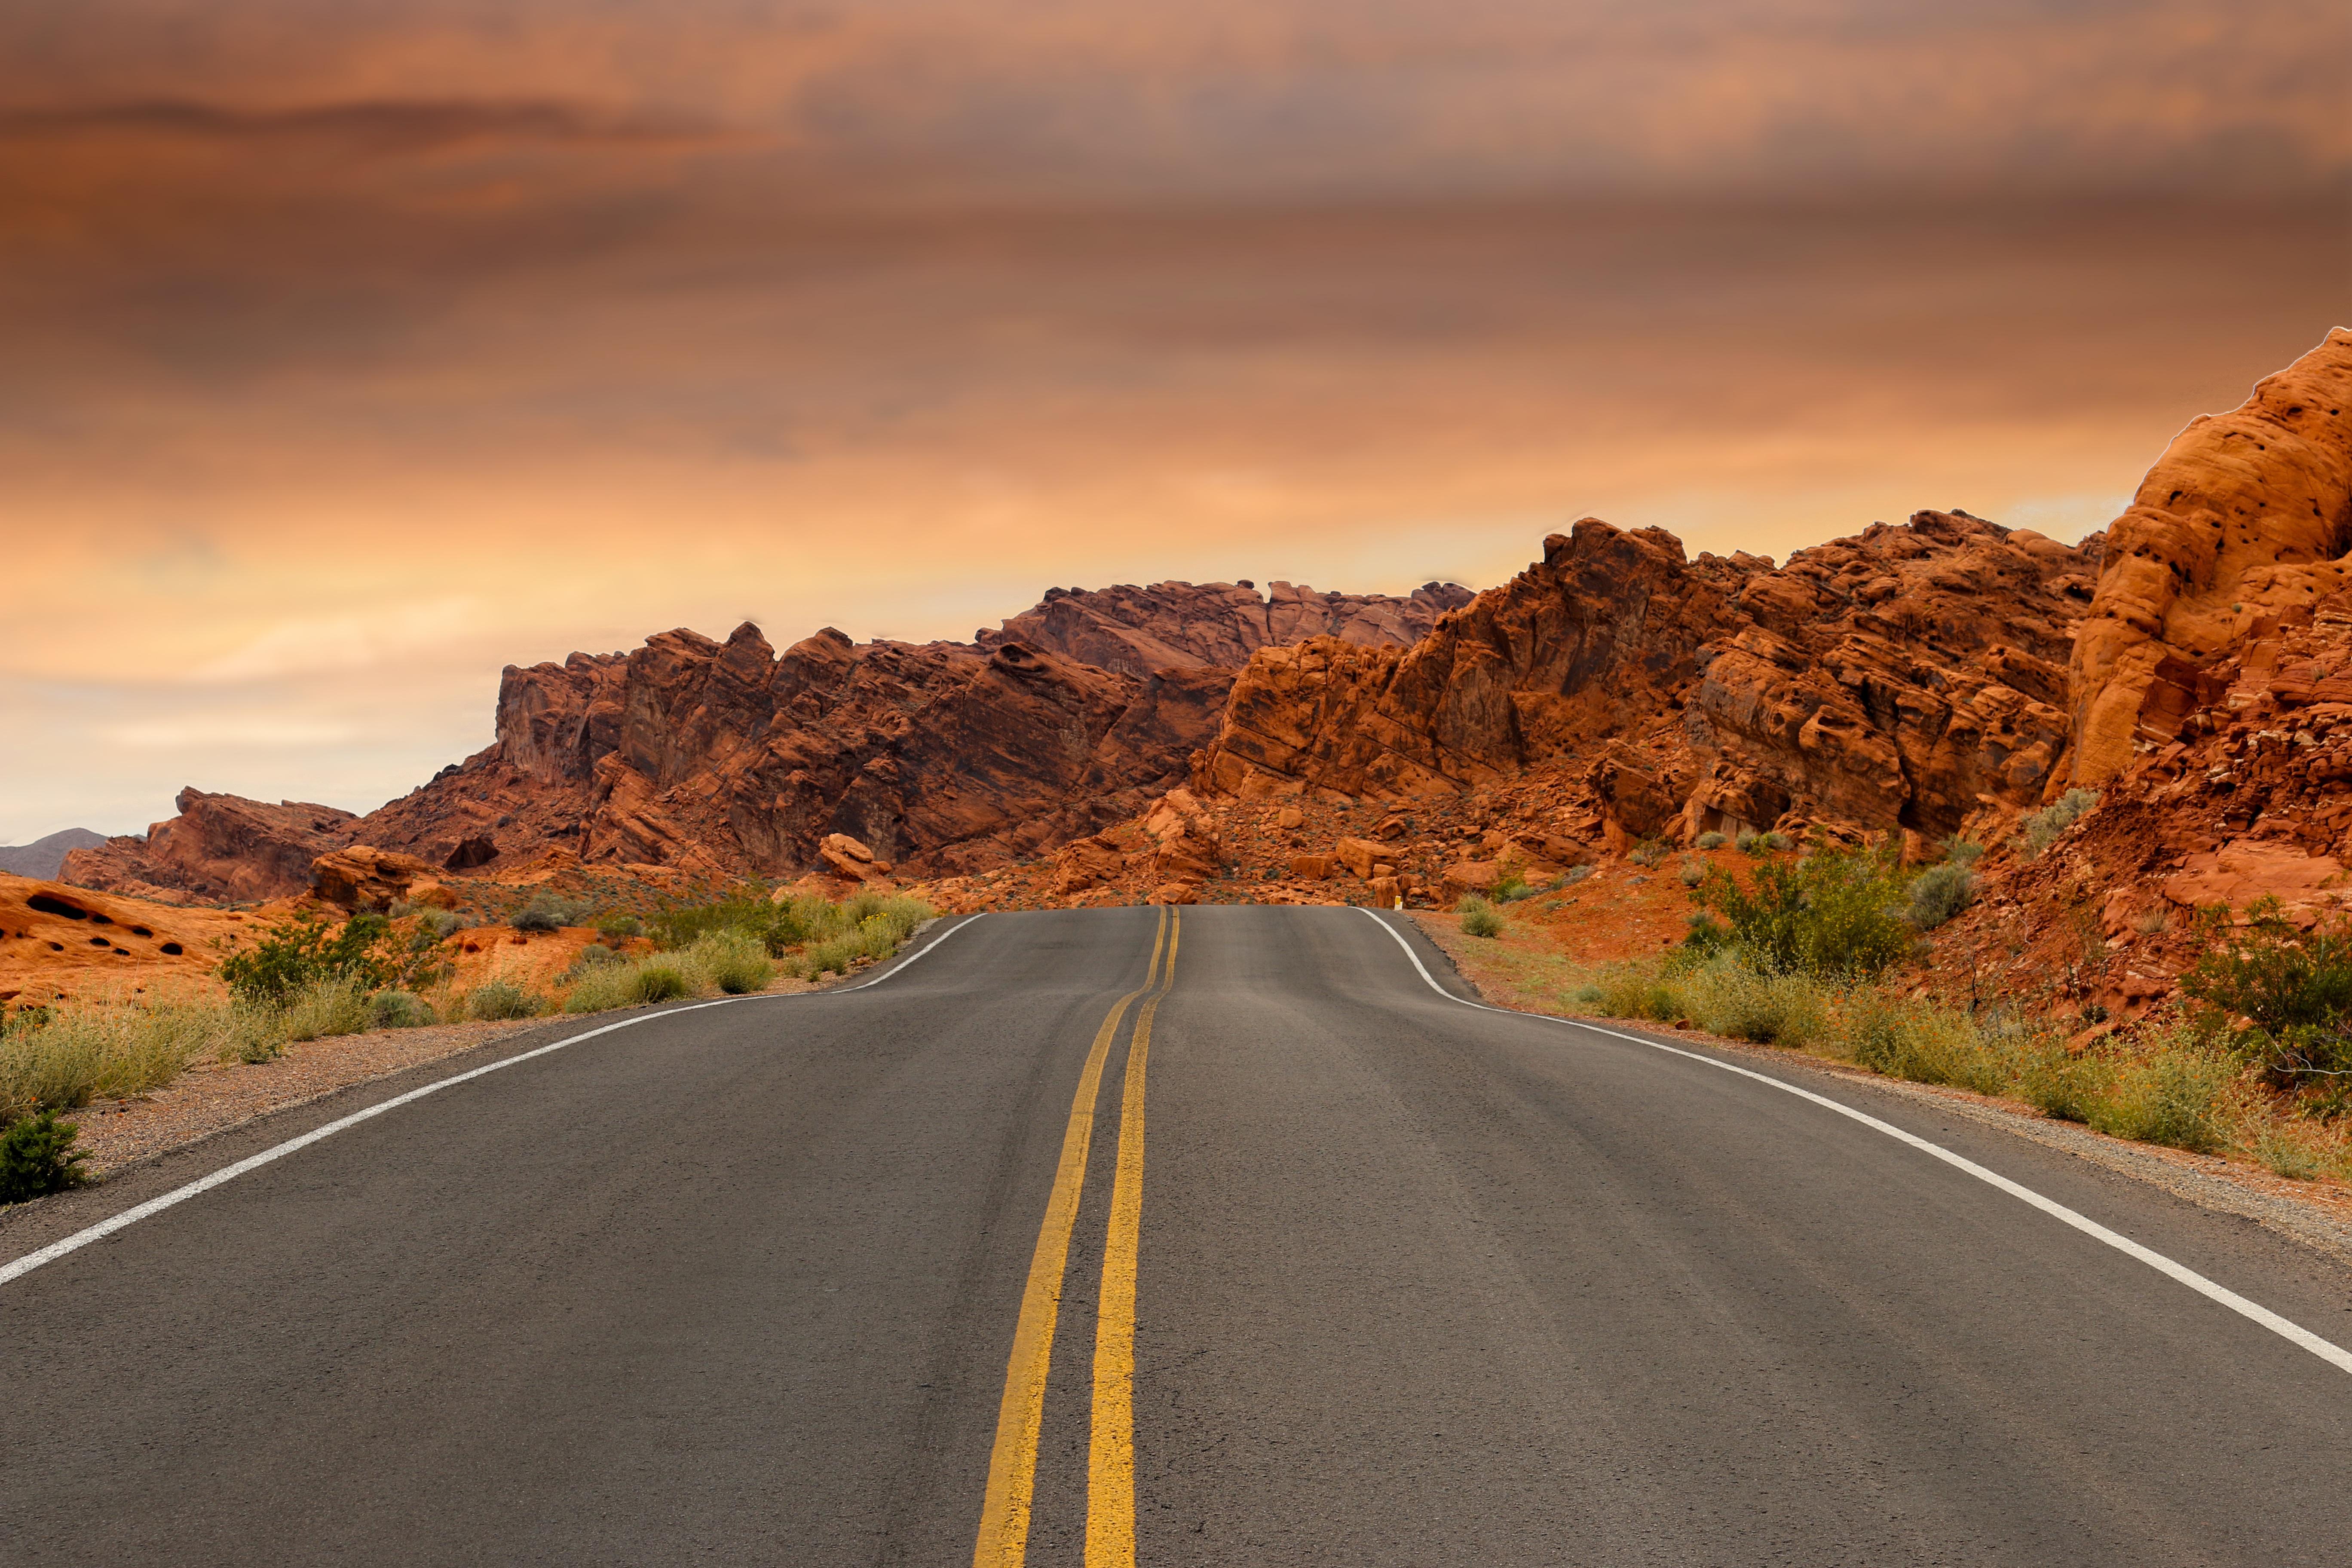 American open road